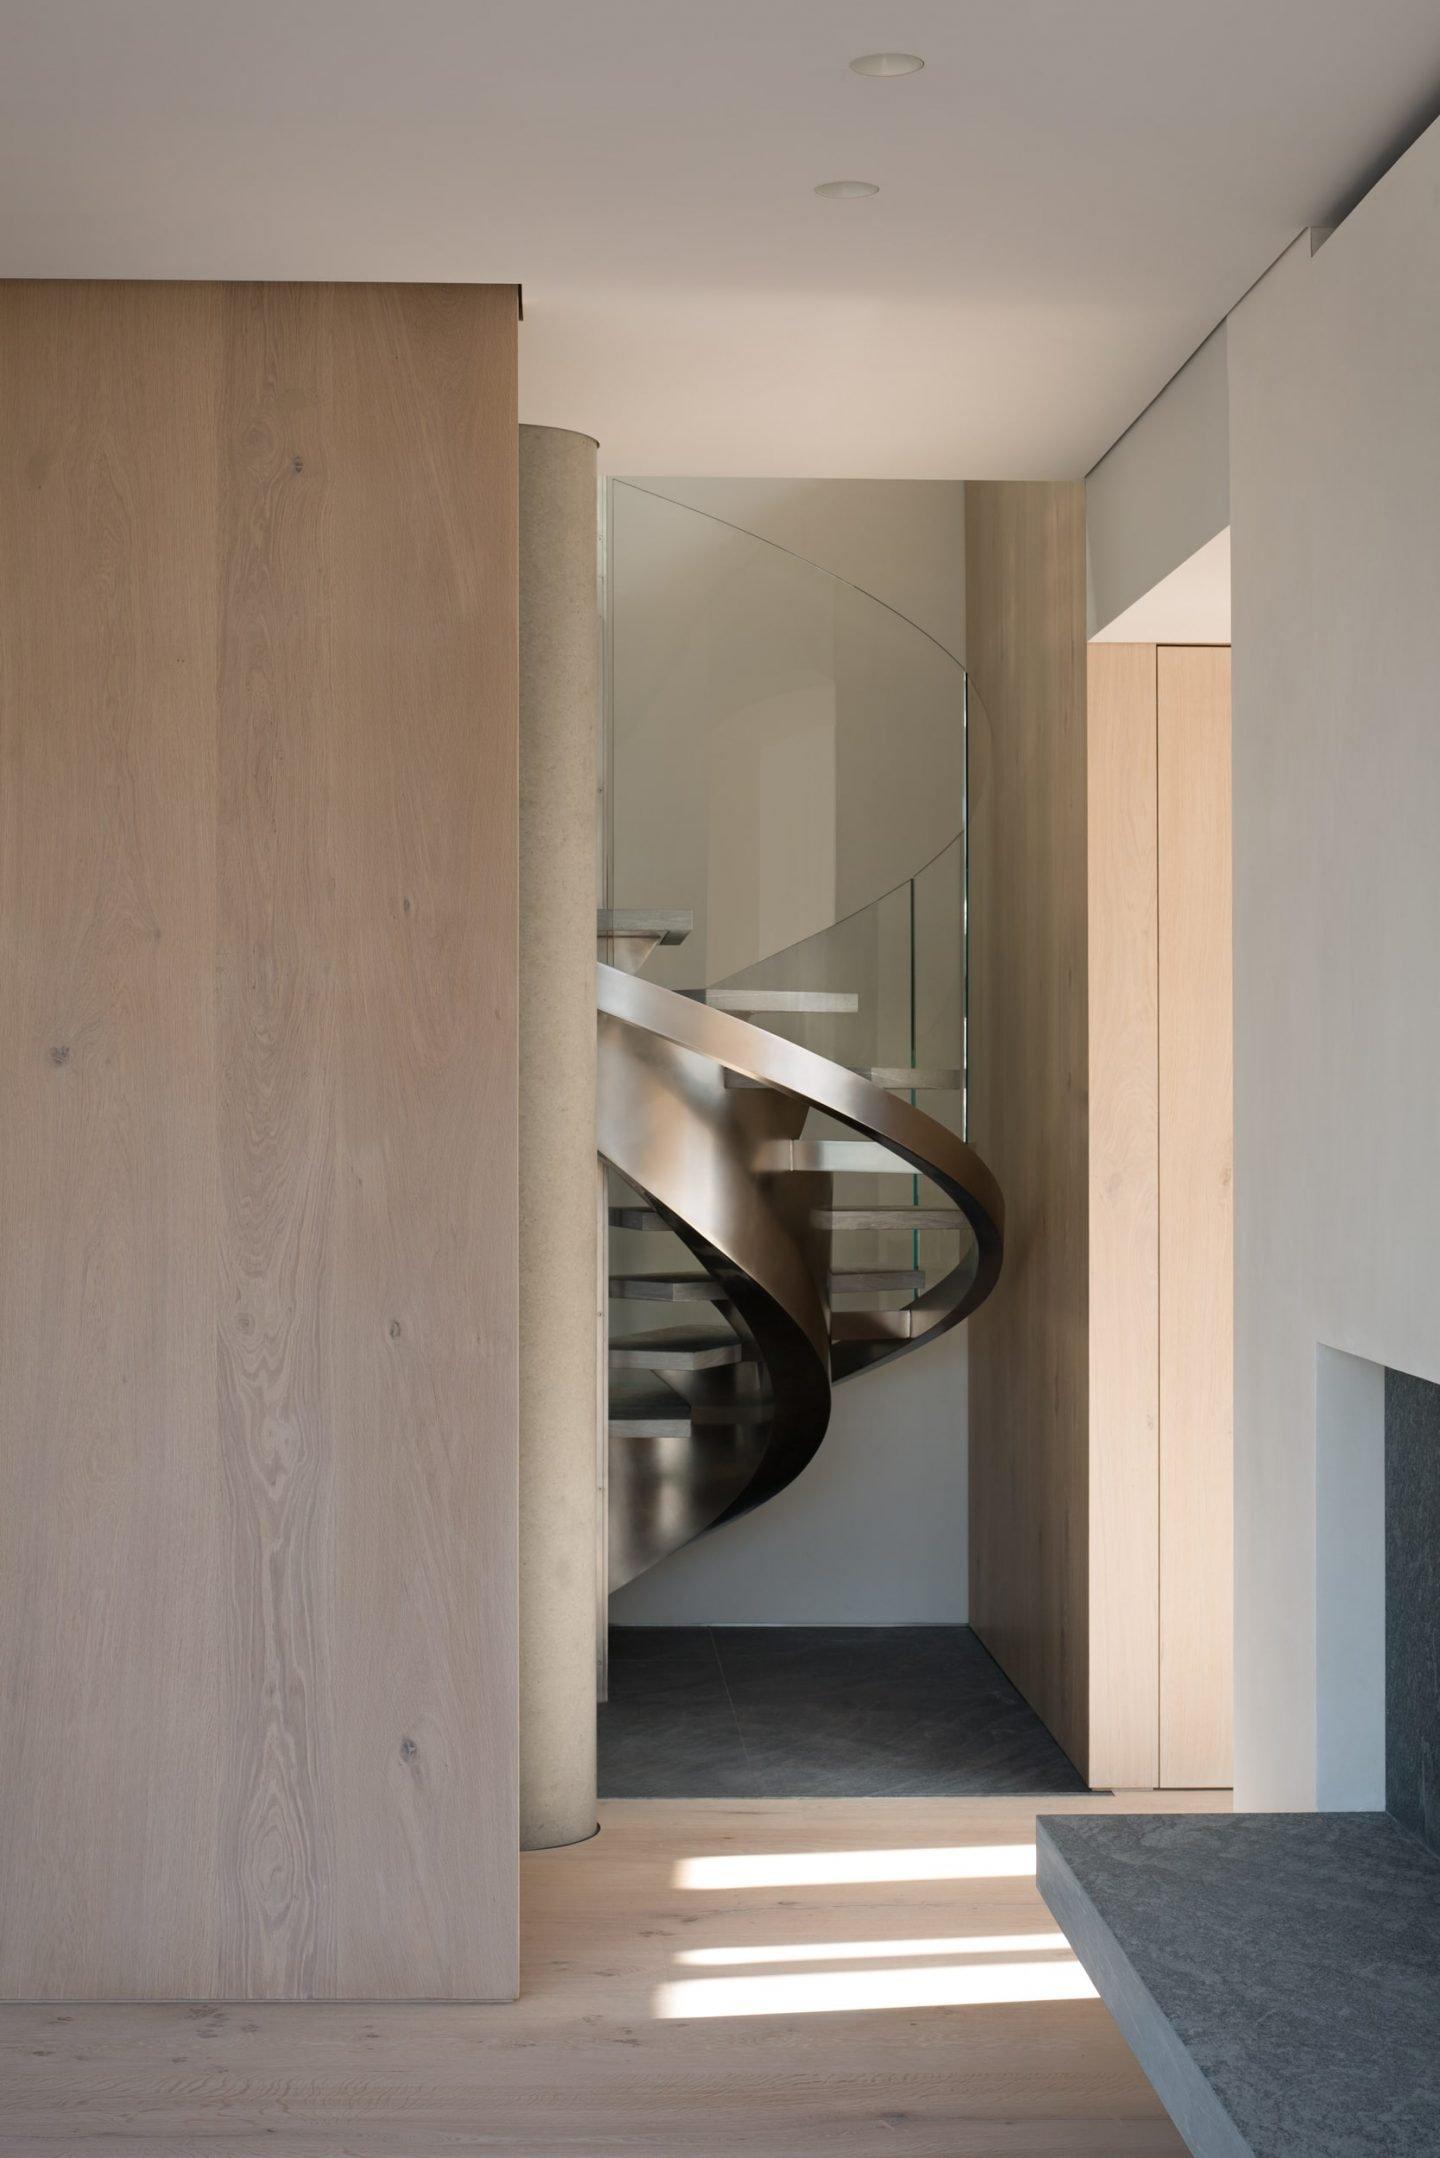 IGNANT-Architecture-Tadao-Ando-Penthouse-Eric-Petschek-08